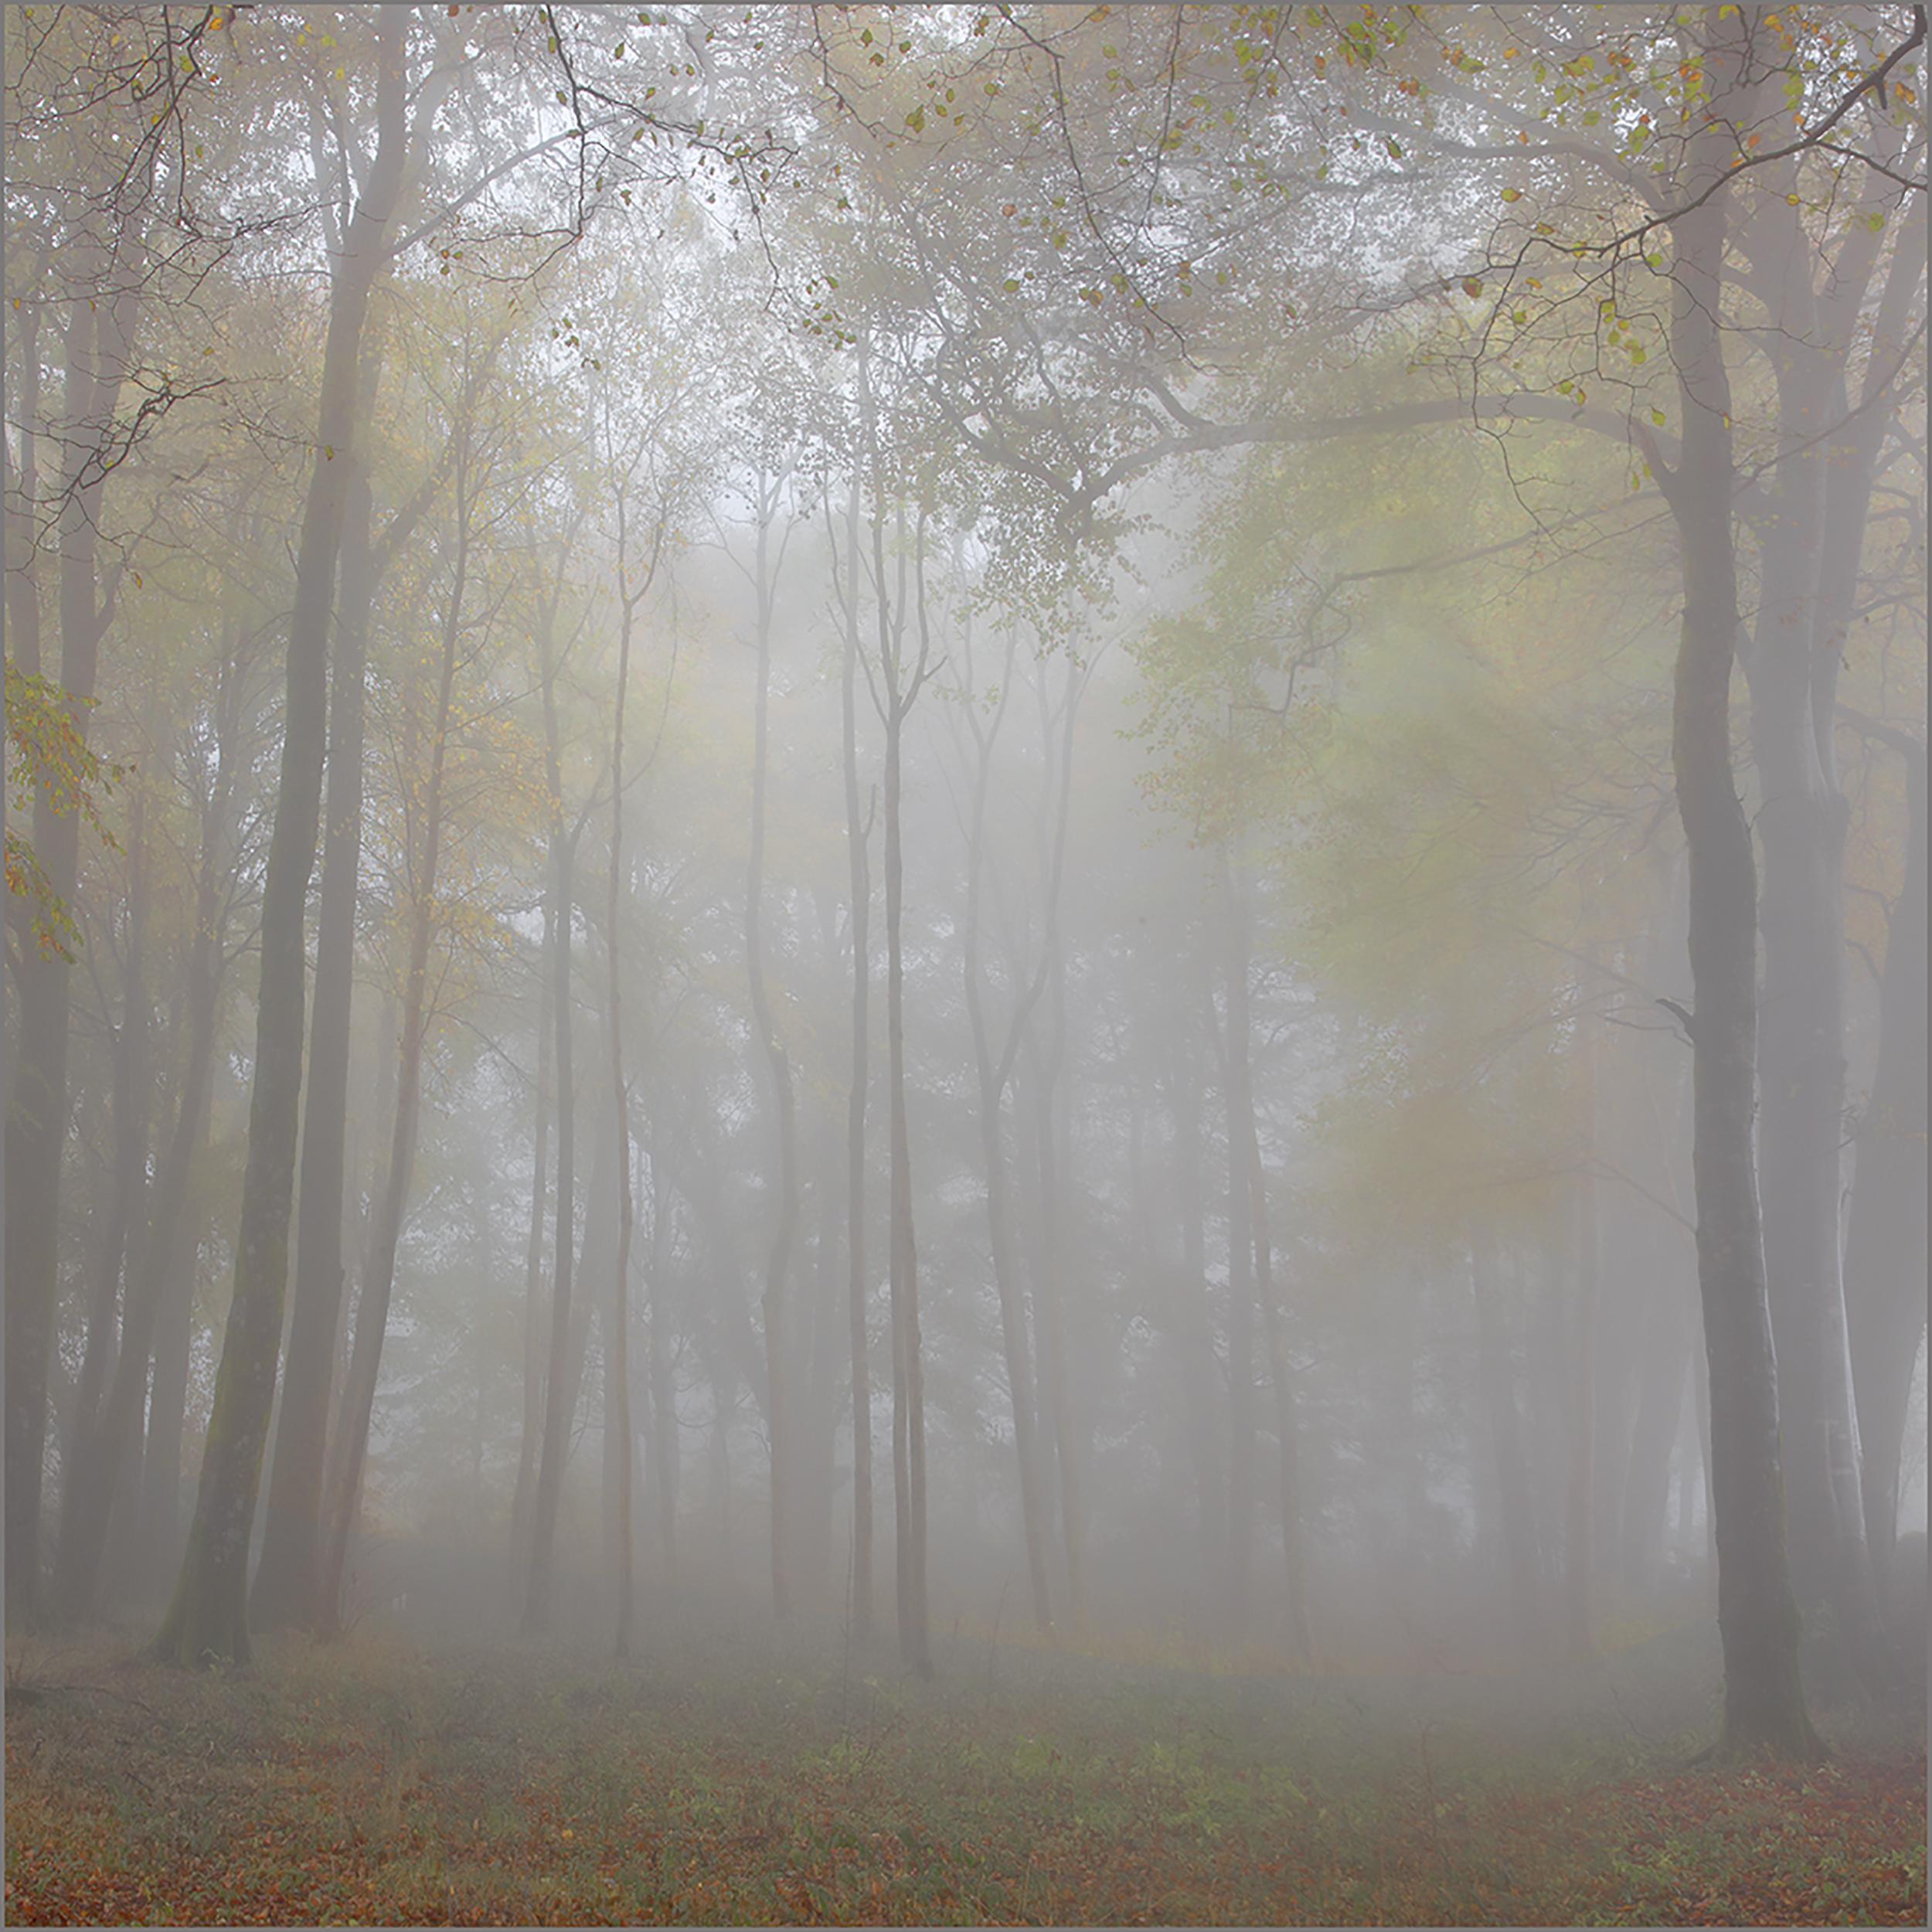 Mist among the trees.jpg